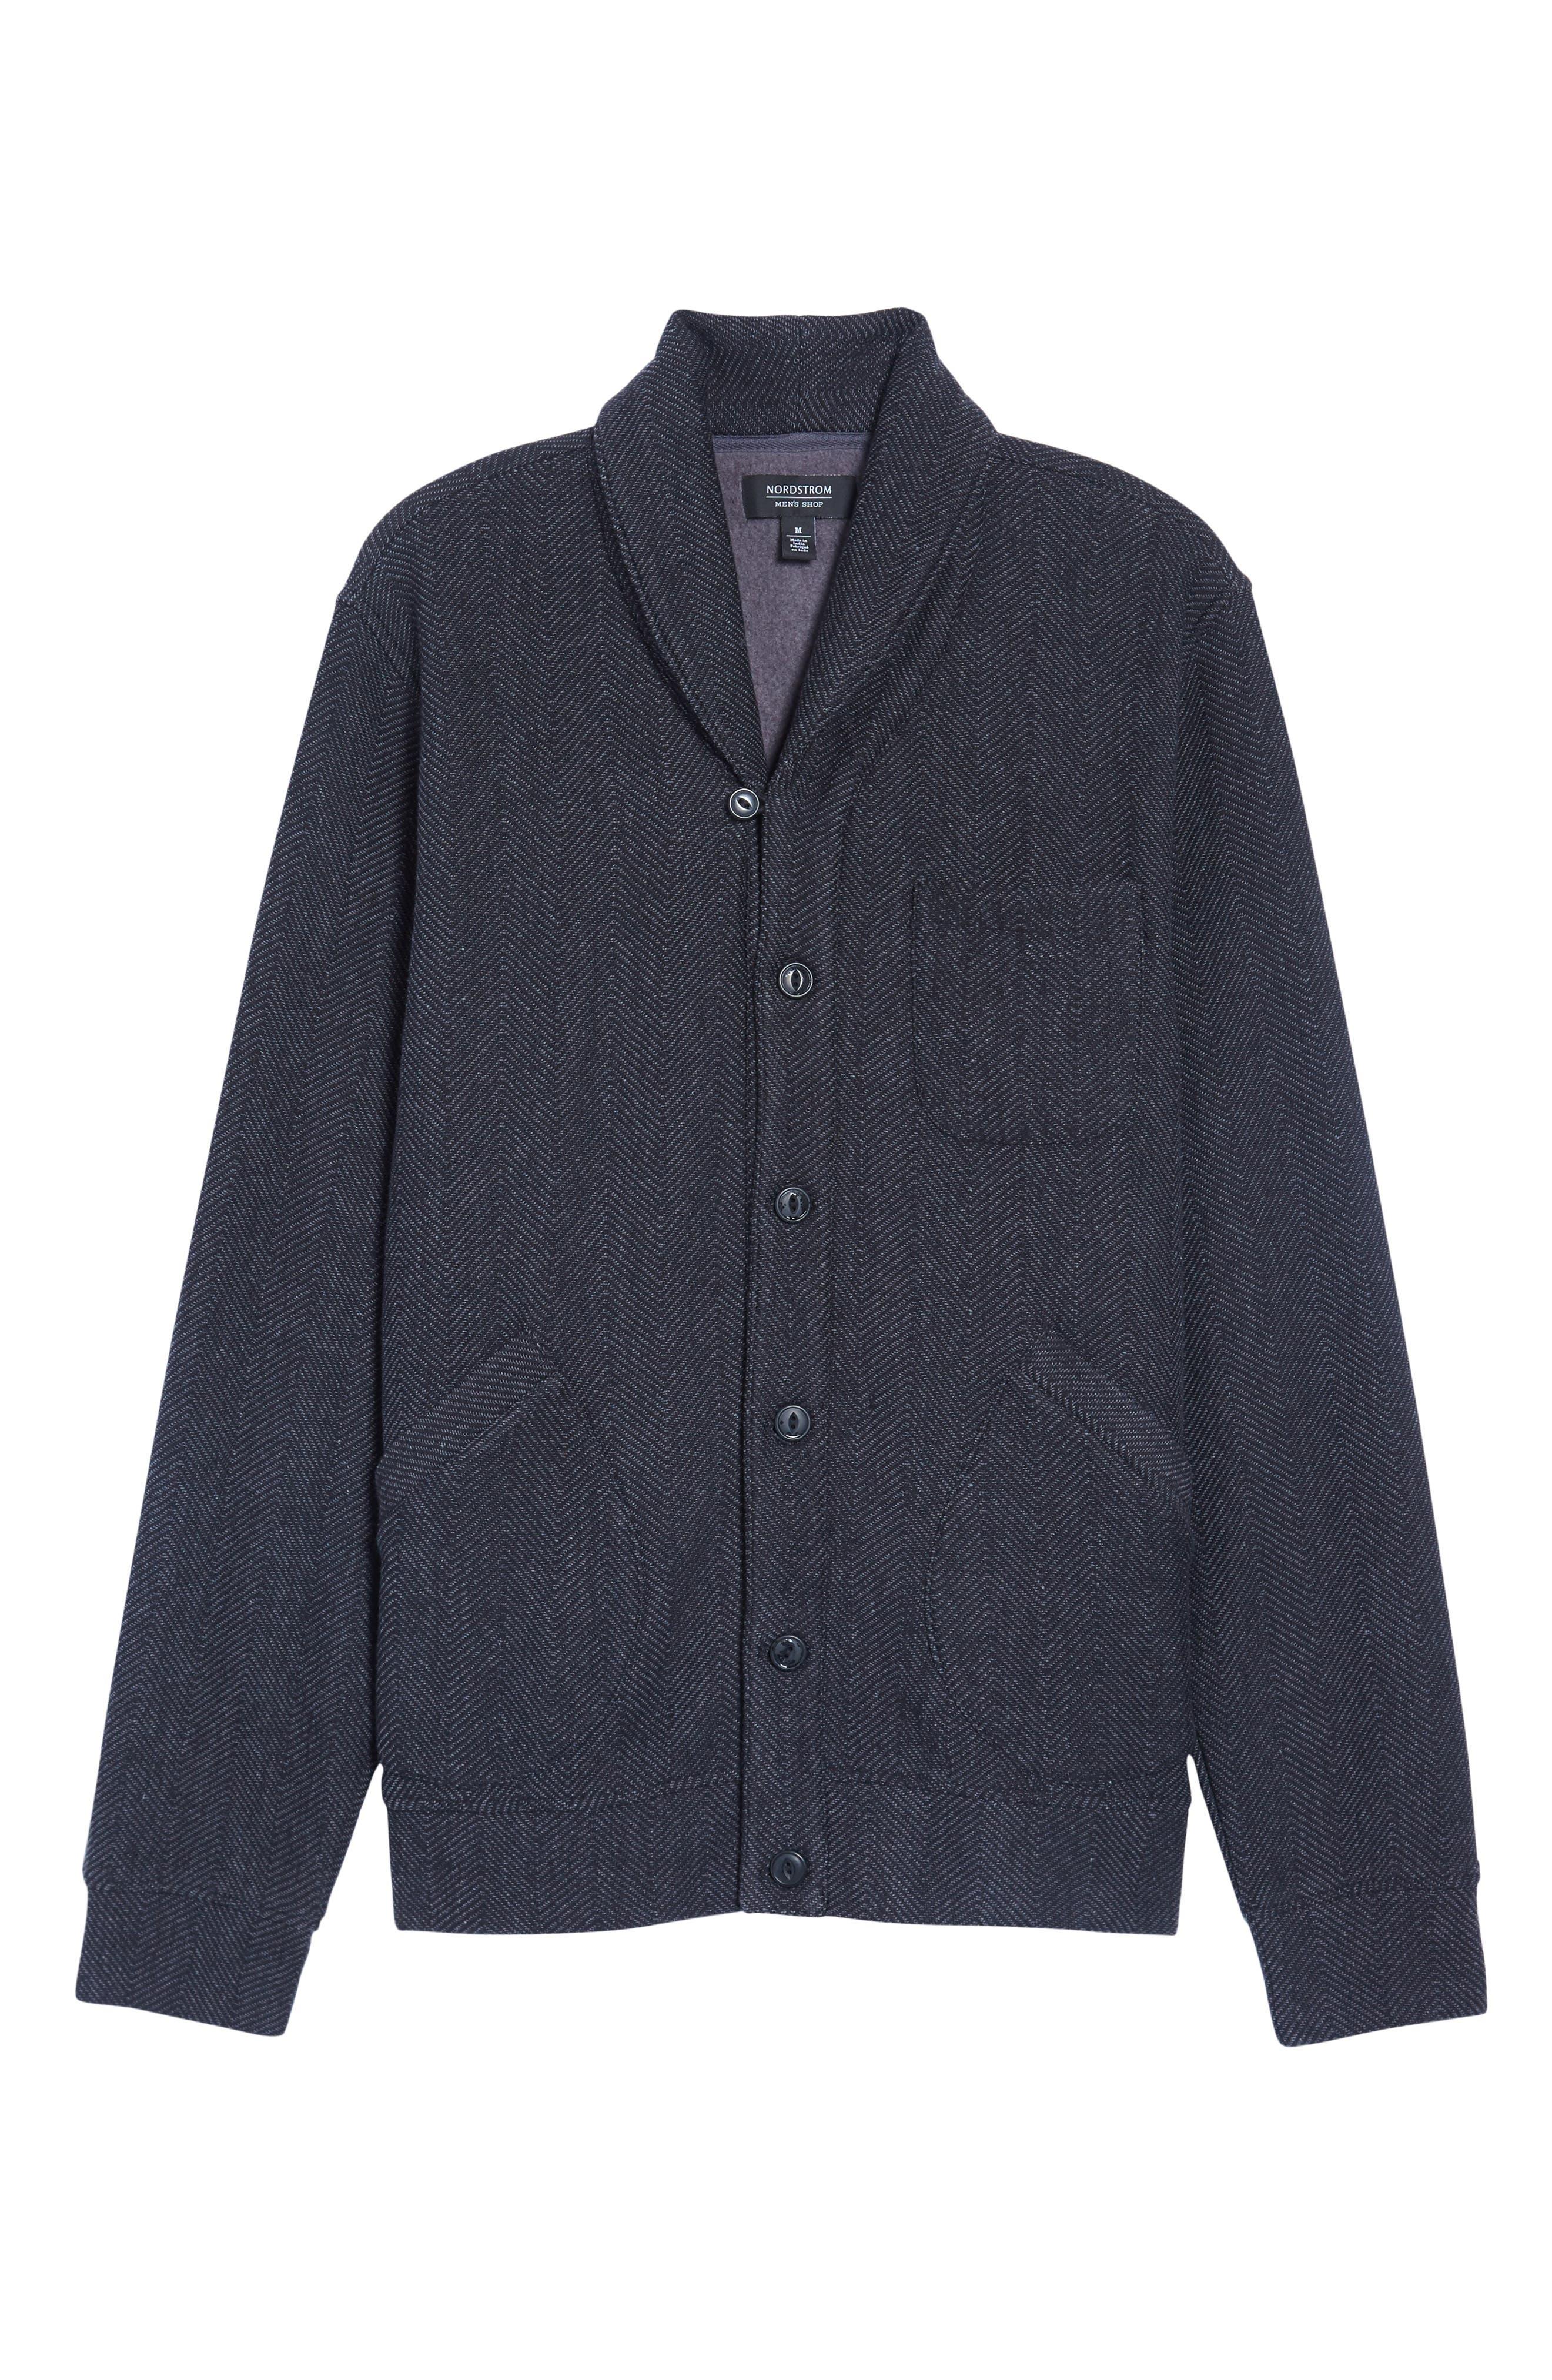 Fleece Lined Shawl Collar Cardigan,                             Alternate thumbnail 6, color,                             Grey Phantom Herringbone